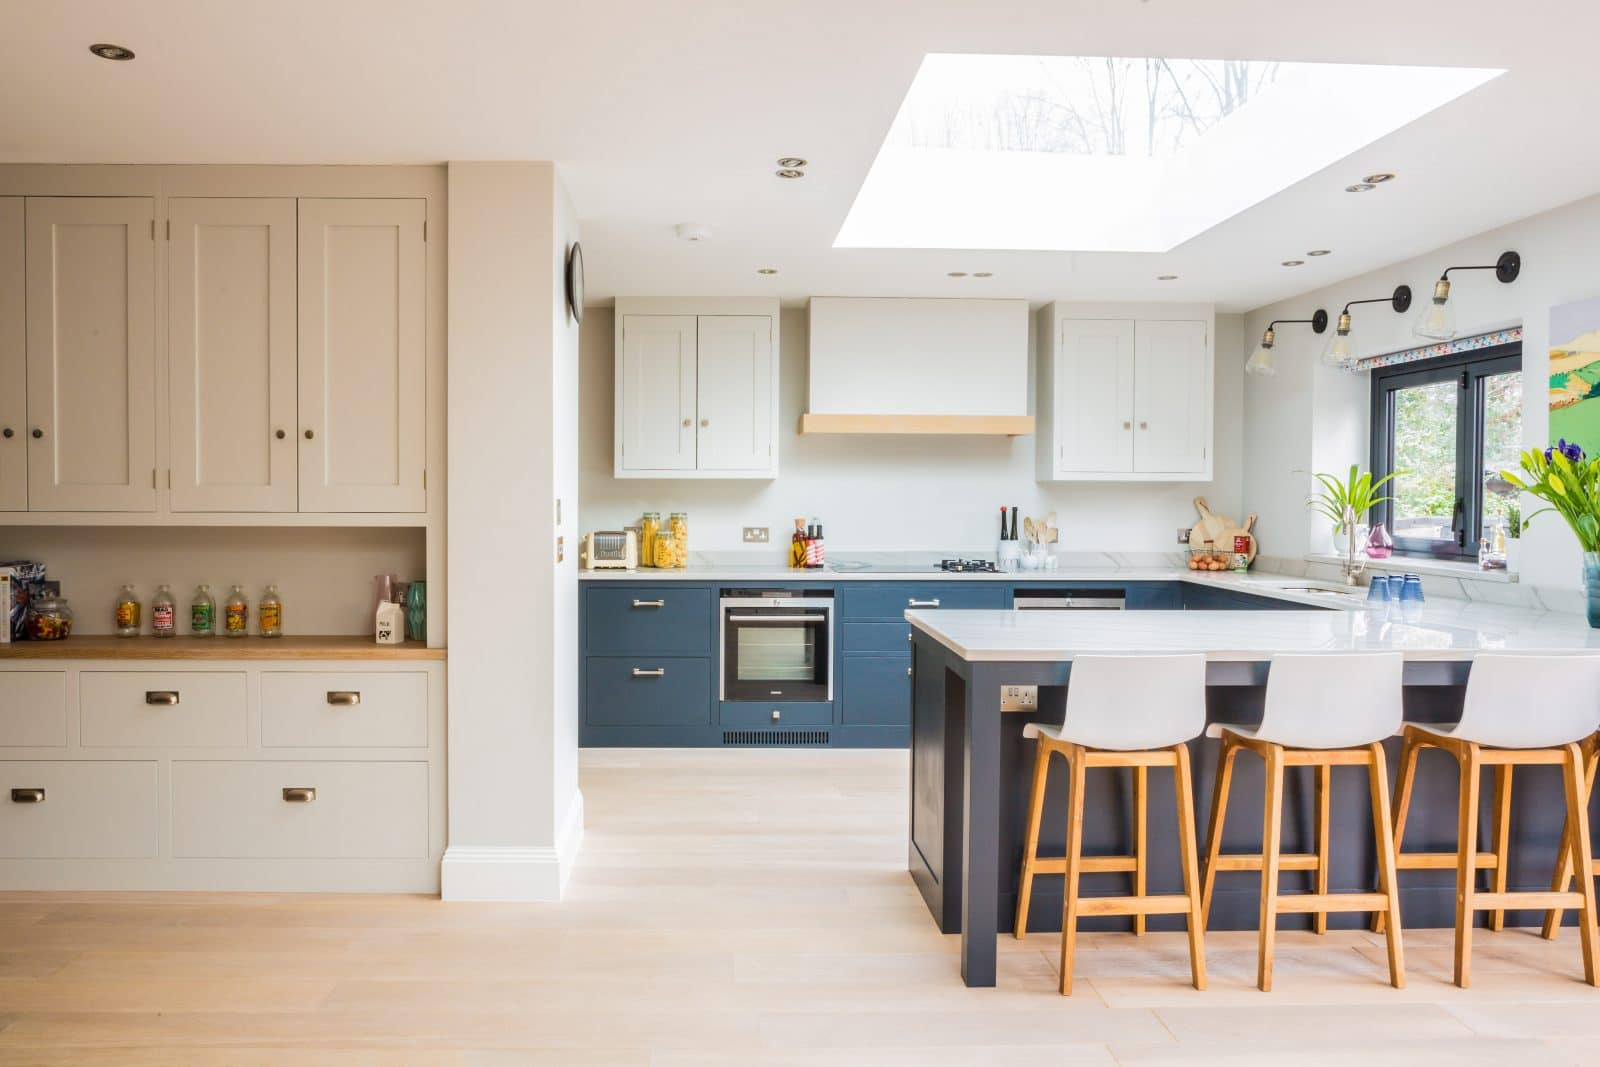 Bespoke Kitchens our bespoke kitchens - sustainable kitchens